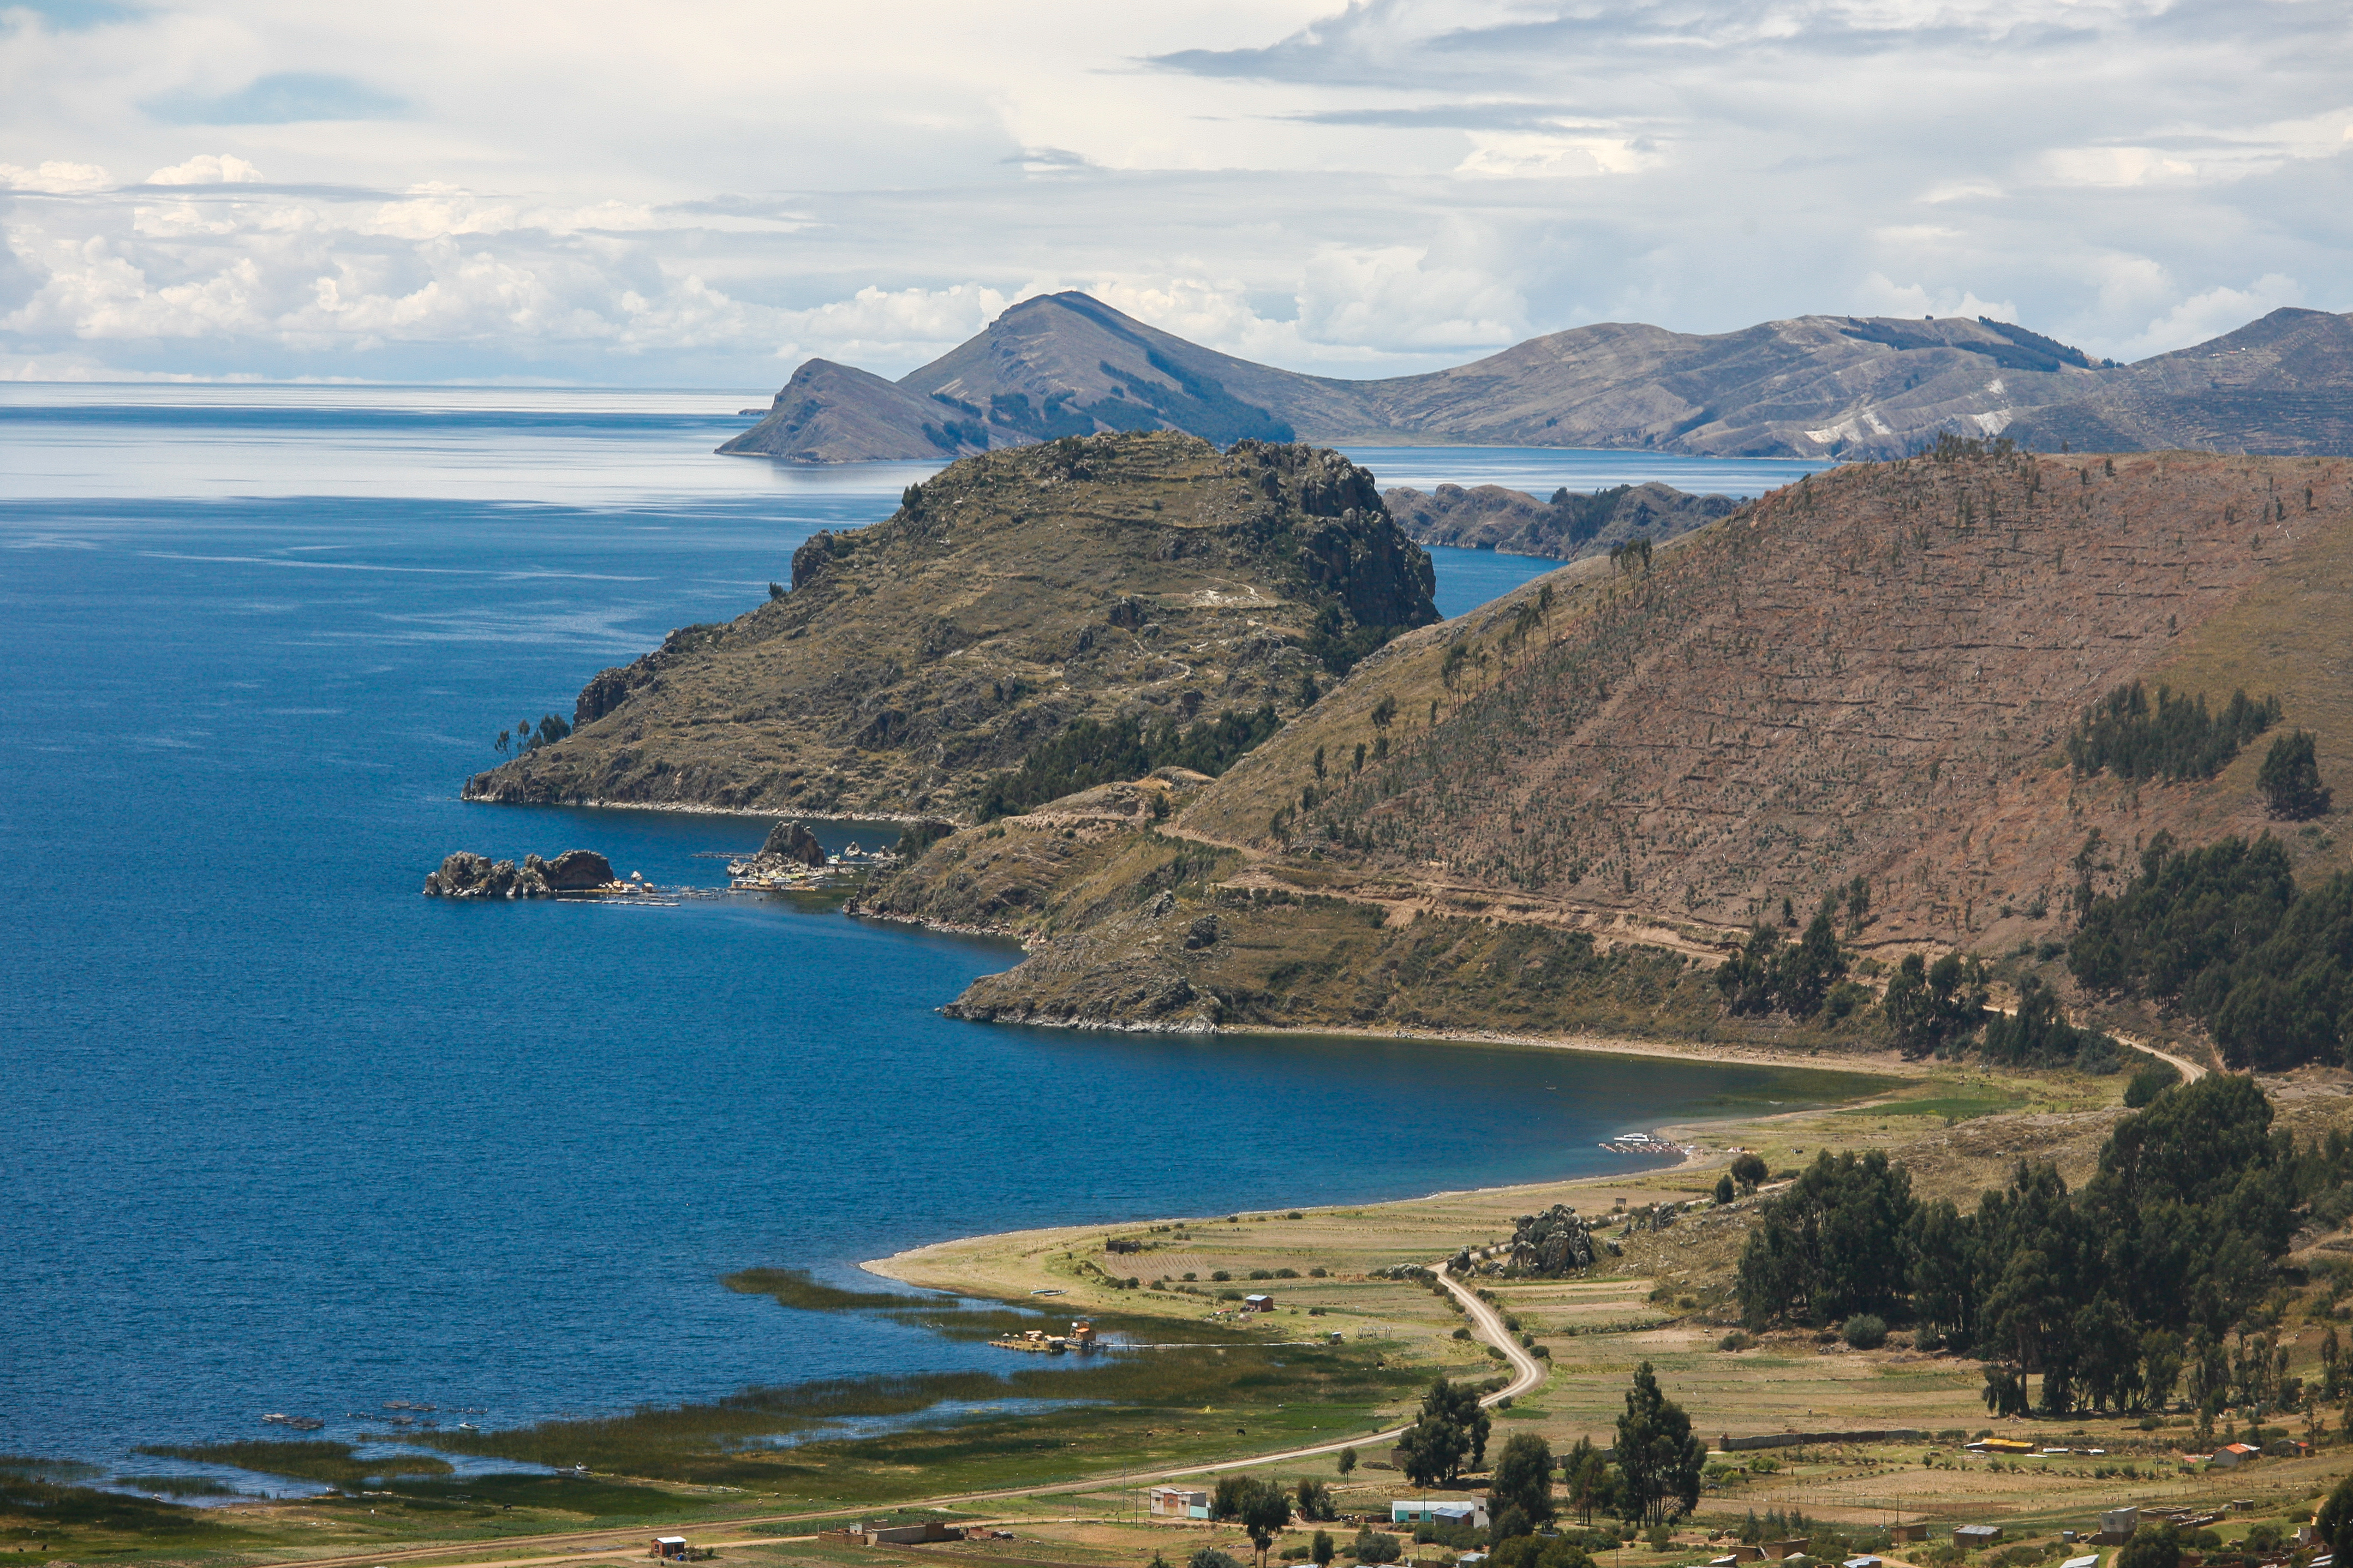 File:Lake Titicaca - Road to Bolivia (8385839315).jpg ...